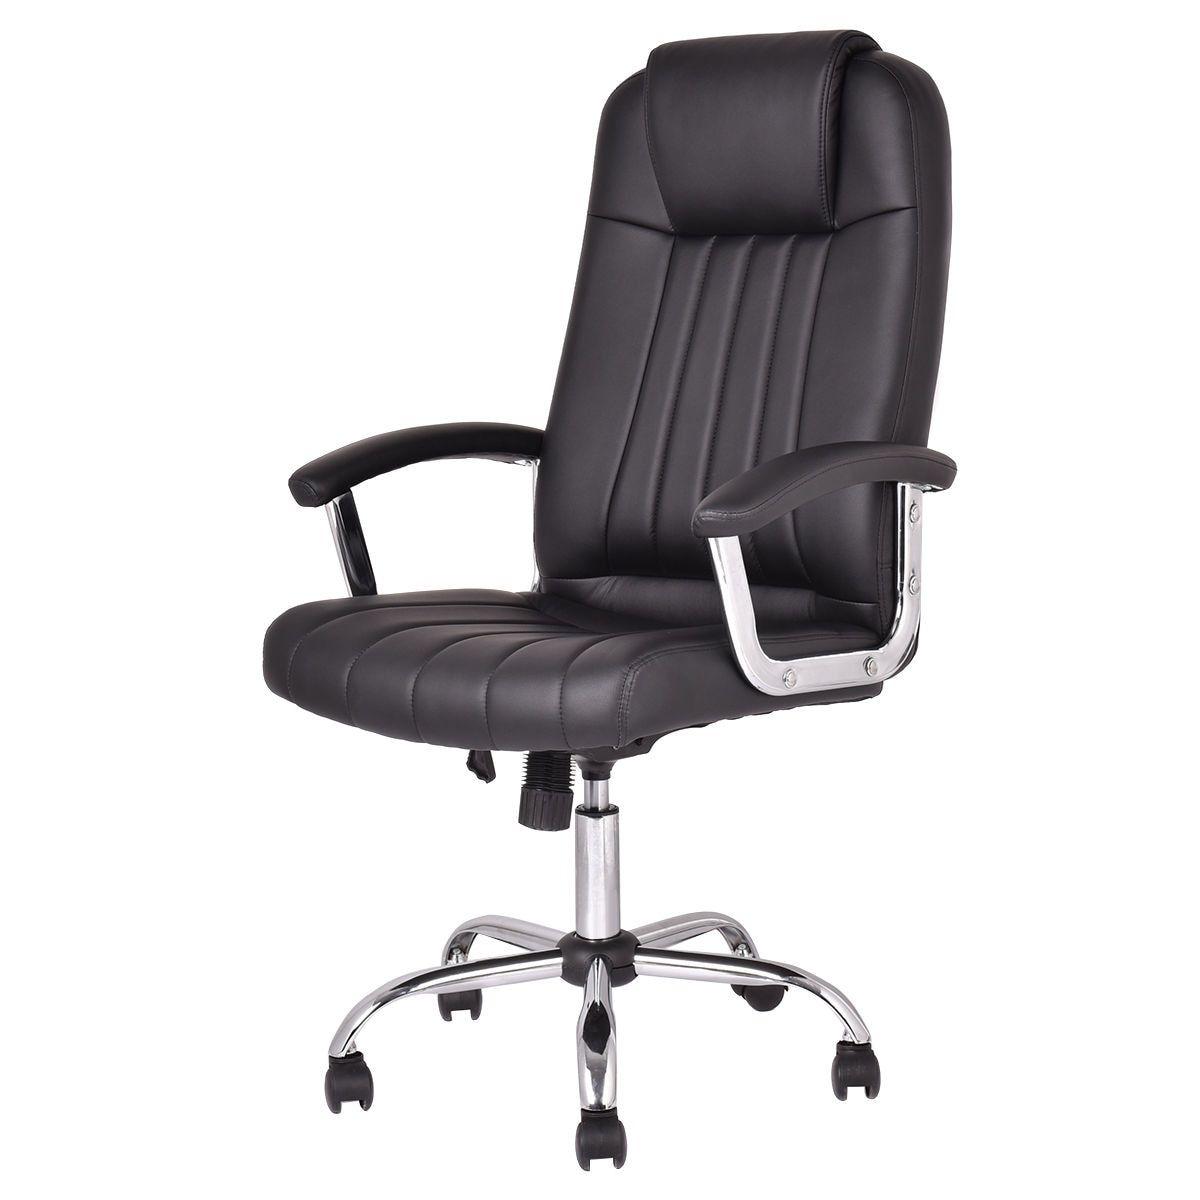 Ergonomic leather office chair price 8395 free